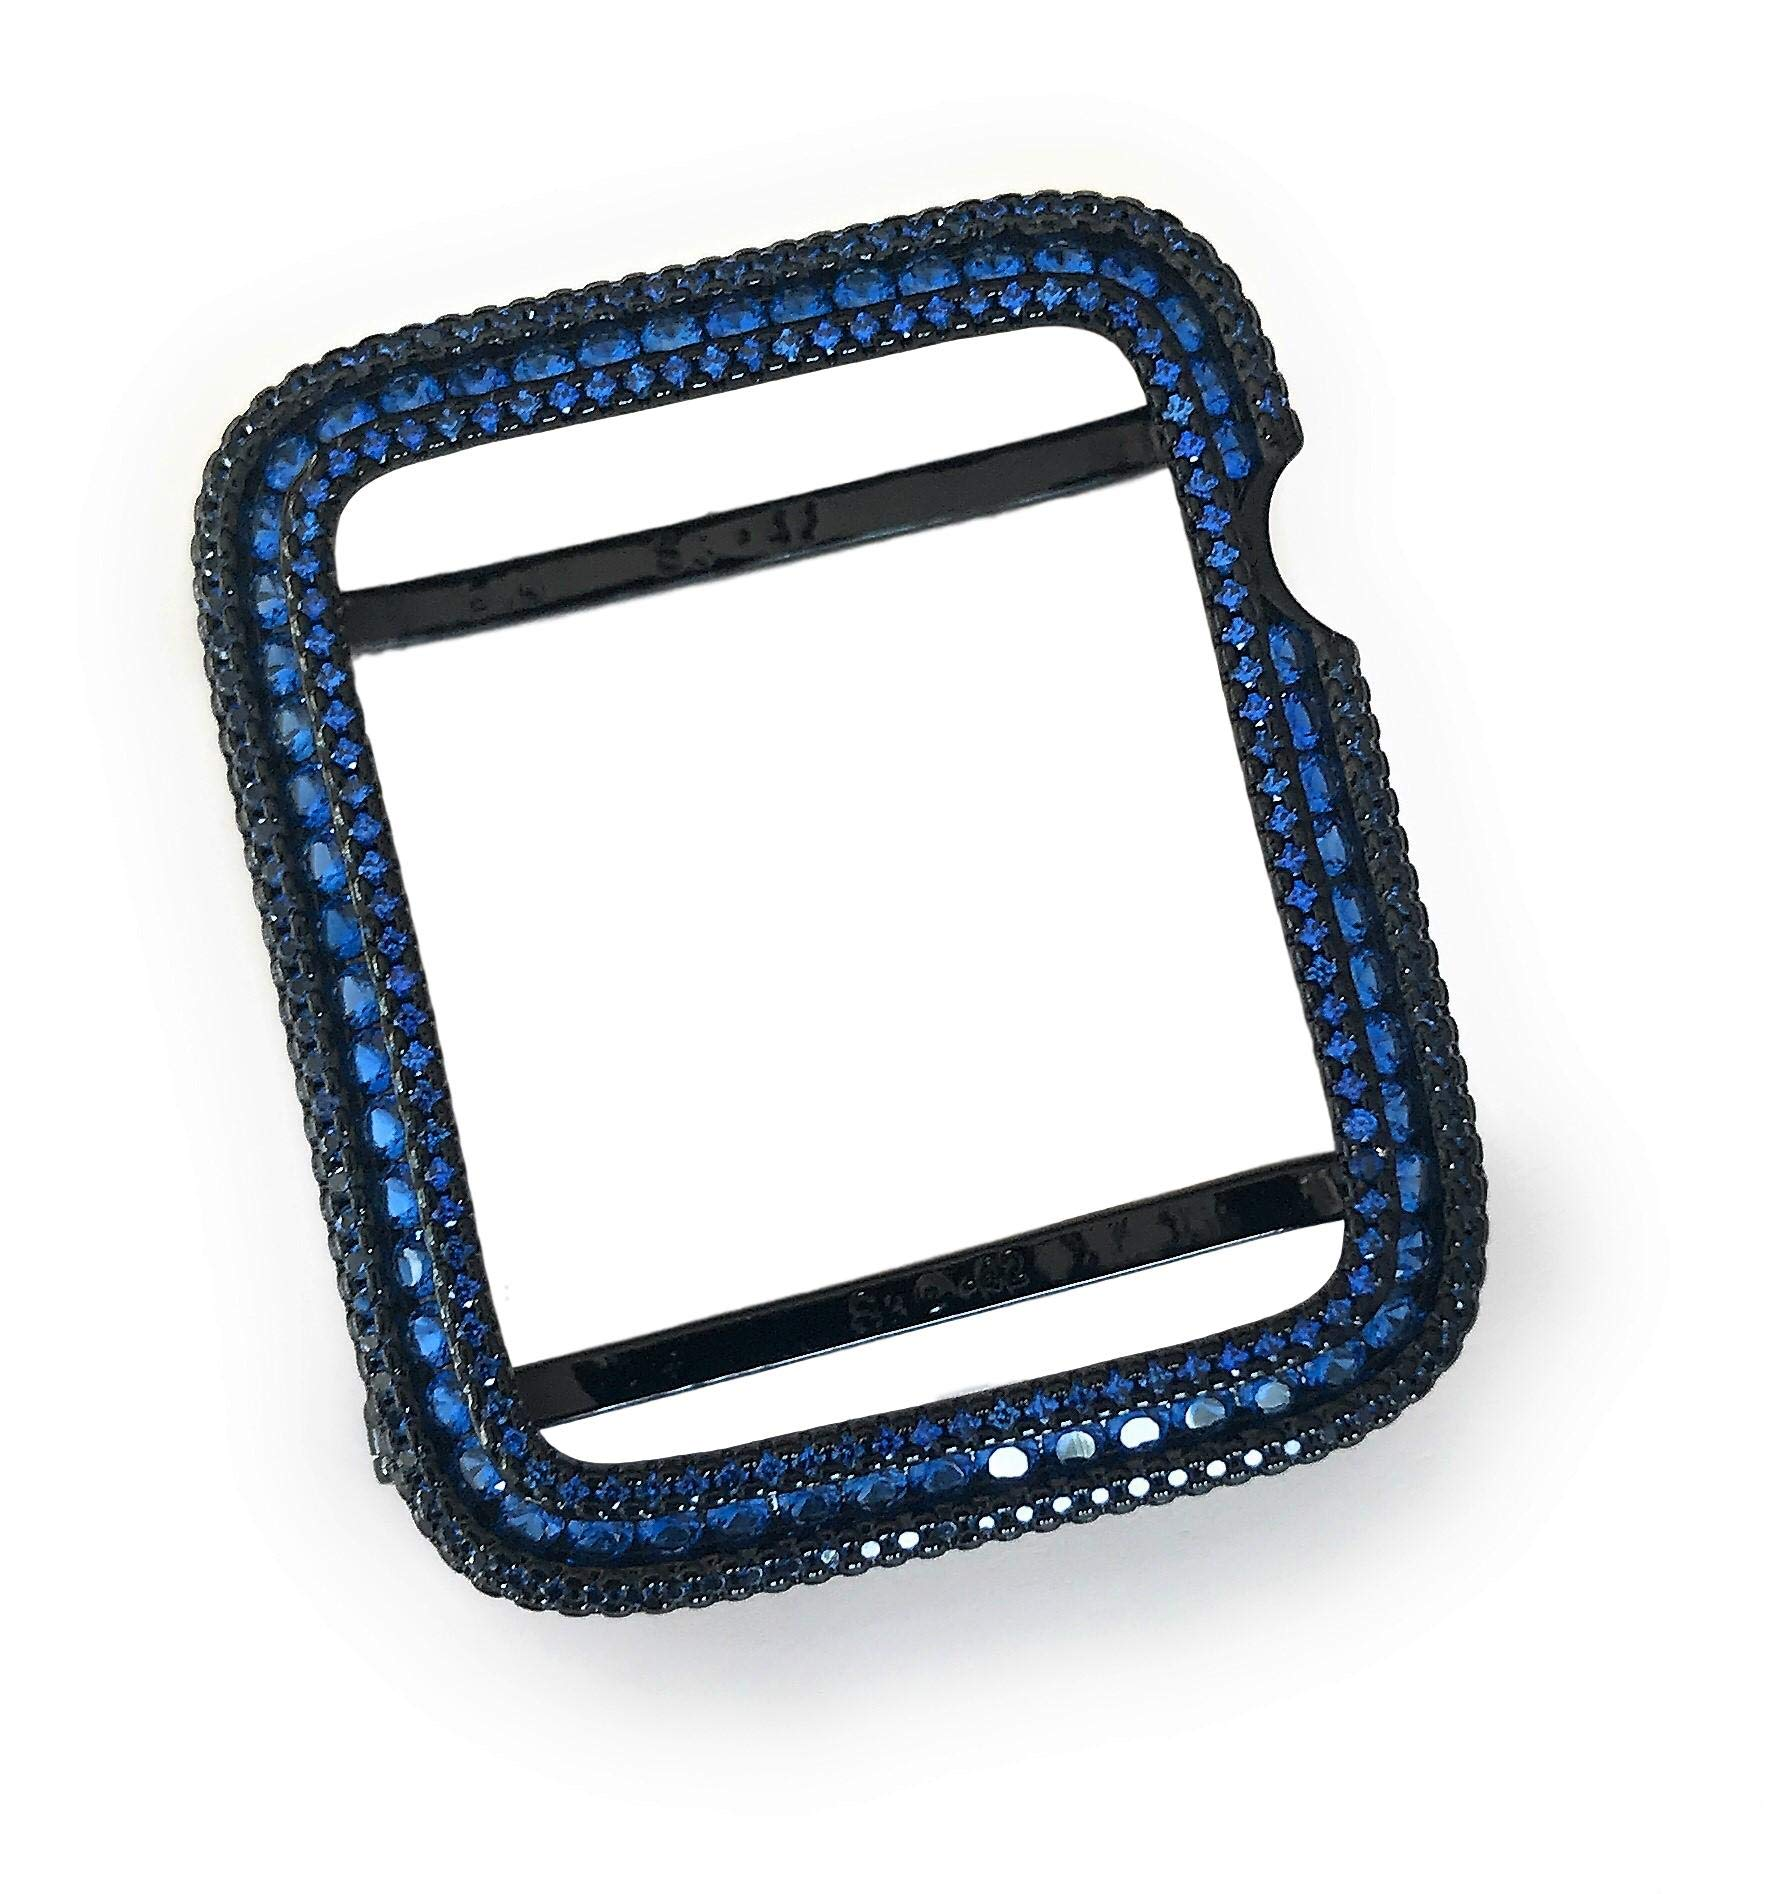 EMJ Bling Apple Watch Series 2/3 Bezel Case Face Cover Blue Lab Diamond Zirconia Black 38/42 mm (42, Series 3 (Non -Ceramic))